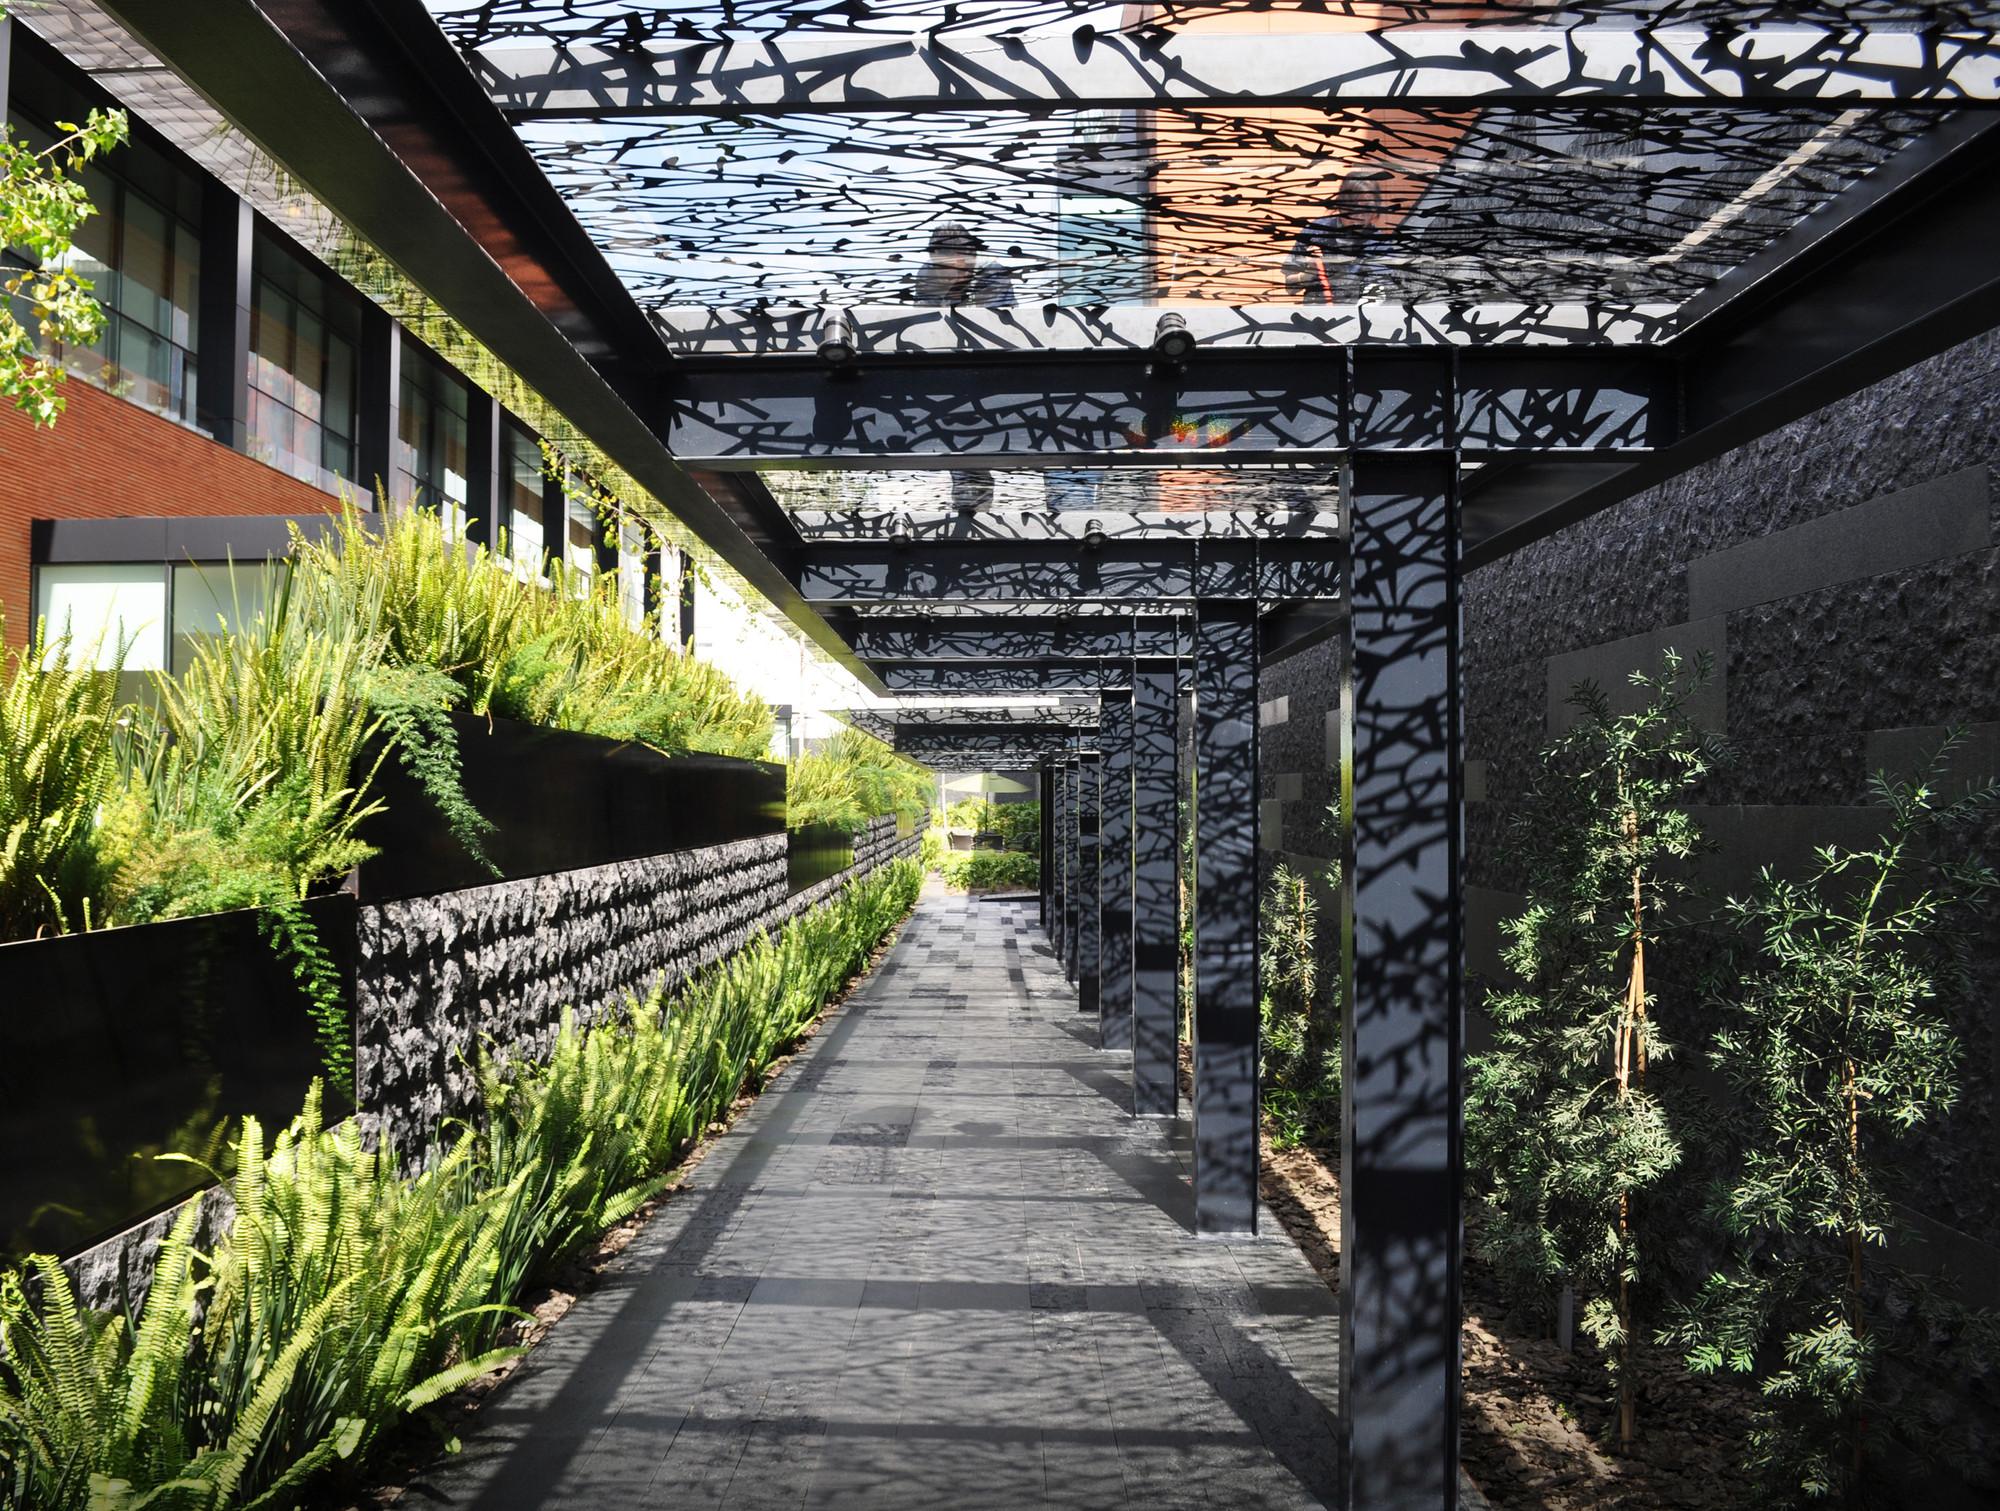 Arquitectura de Paisaje Campus Corporativo Coyoacán / DLC Arquitectos + Colonnier y Asociados, Cortesia de DLC Arquitectos